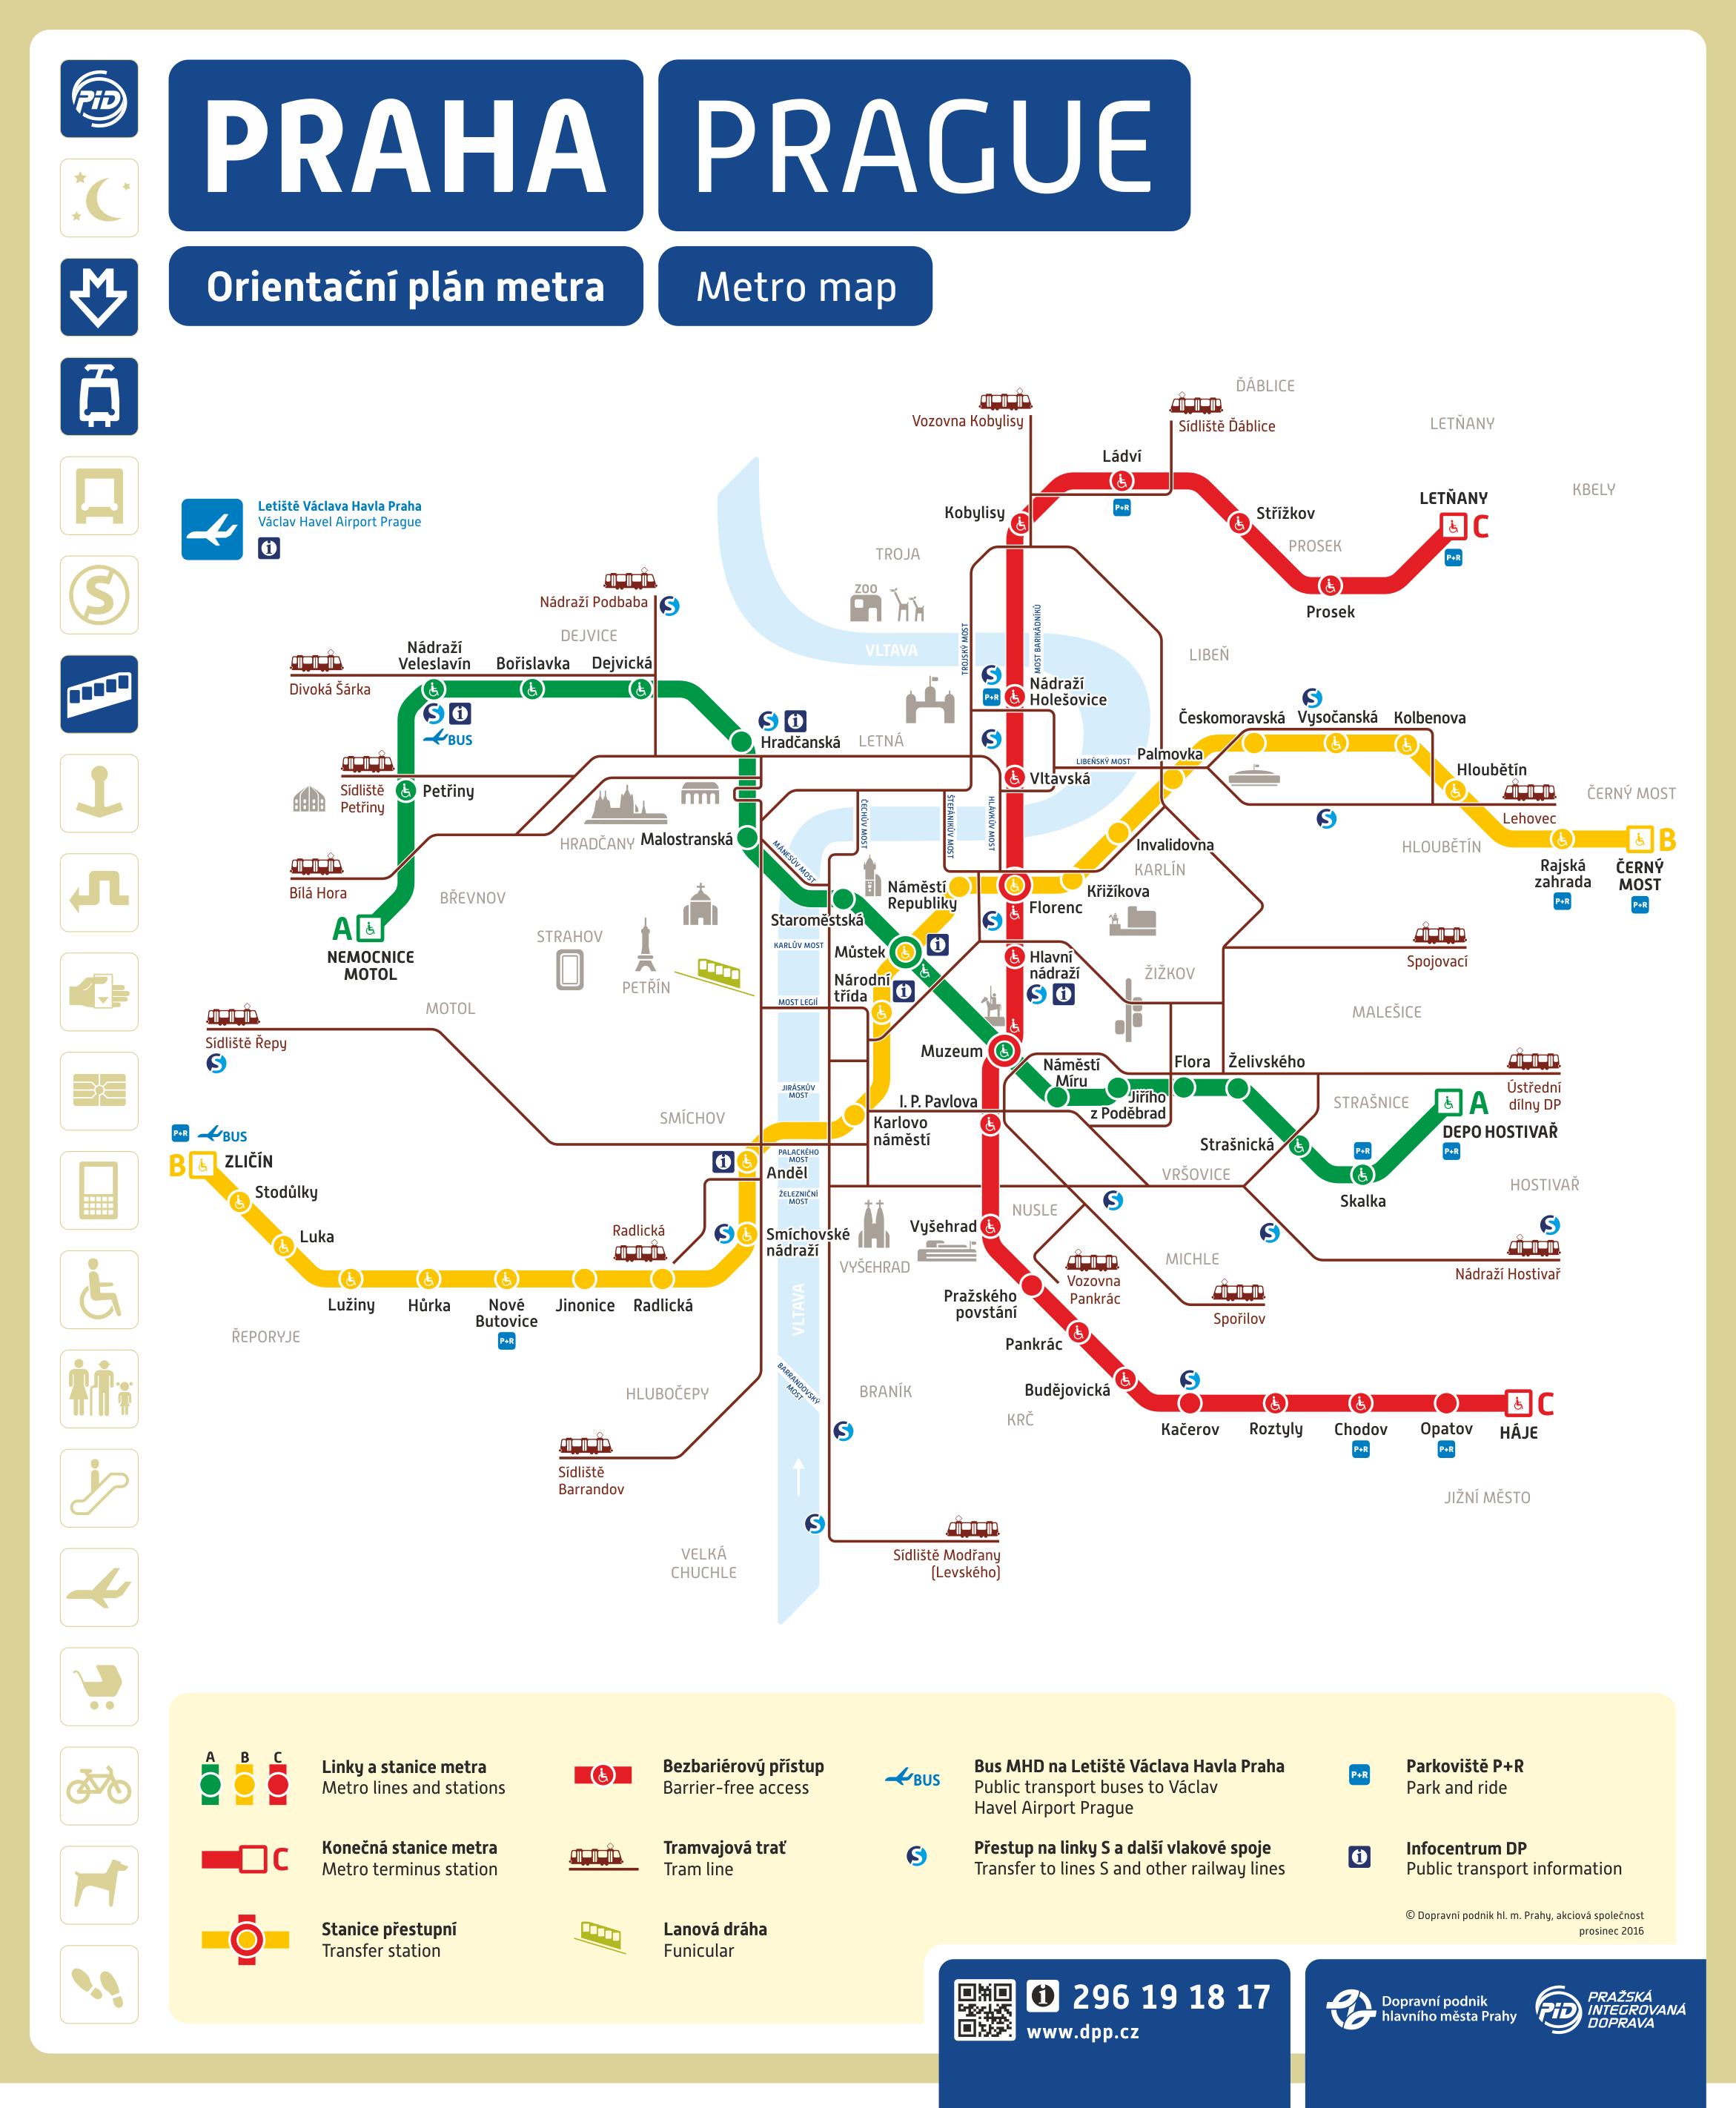 Visit Prague